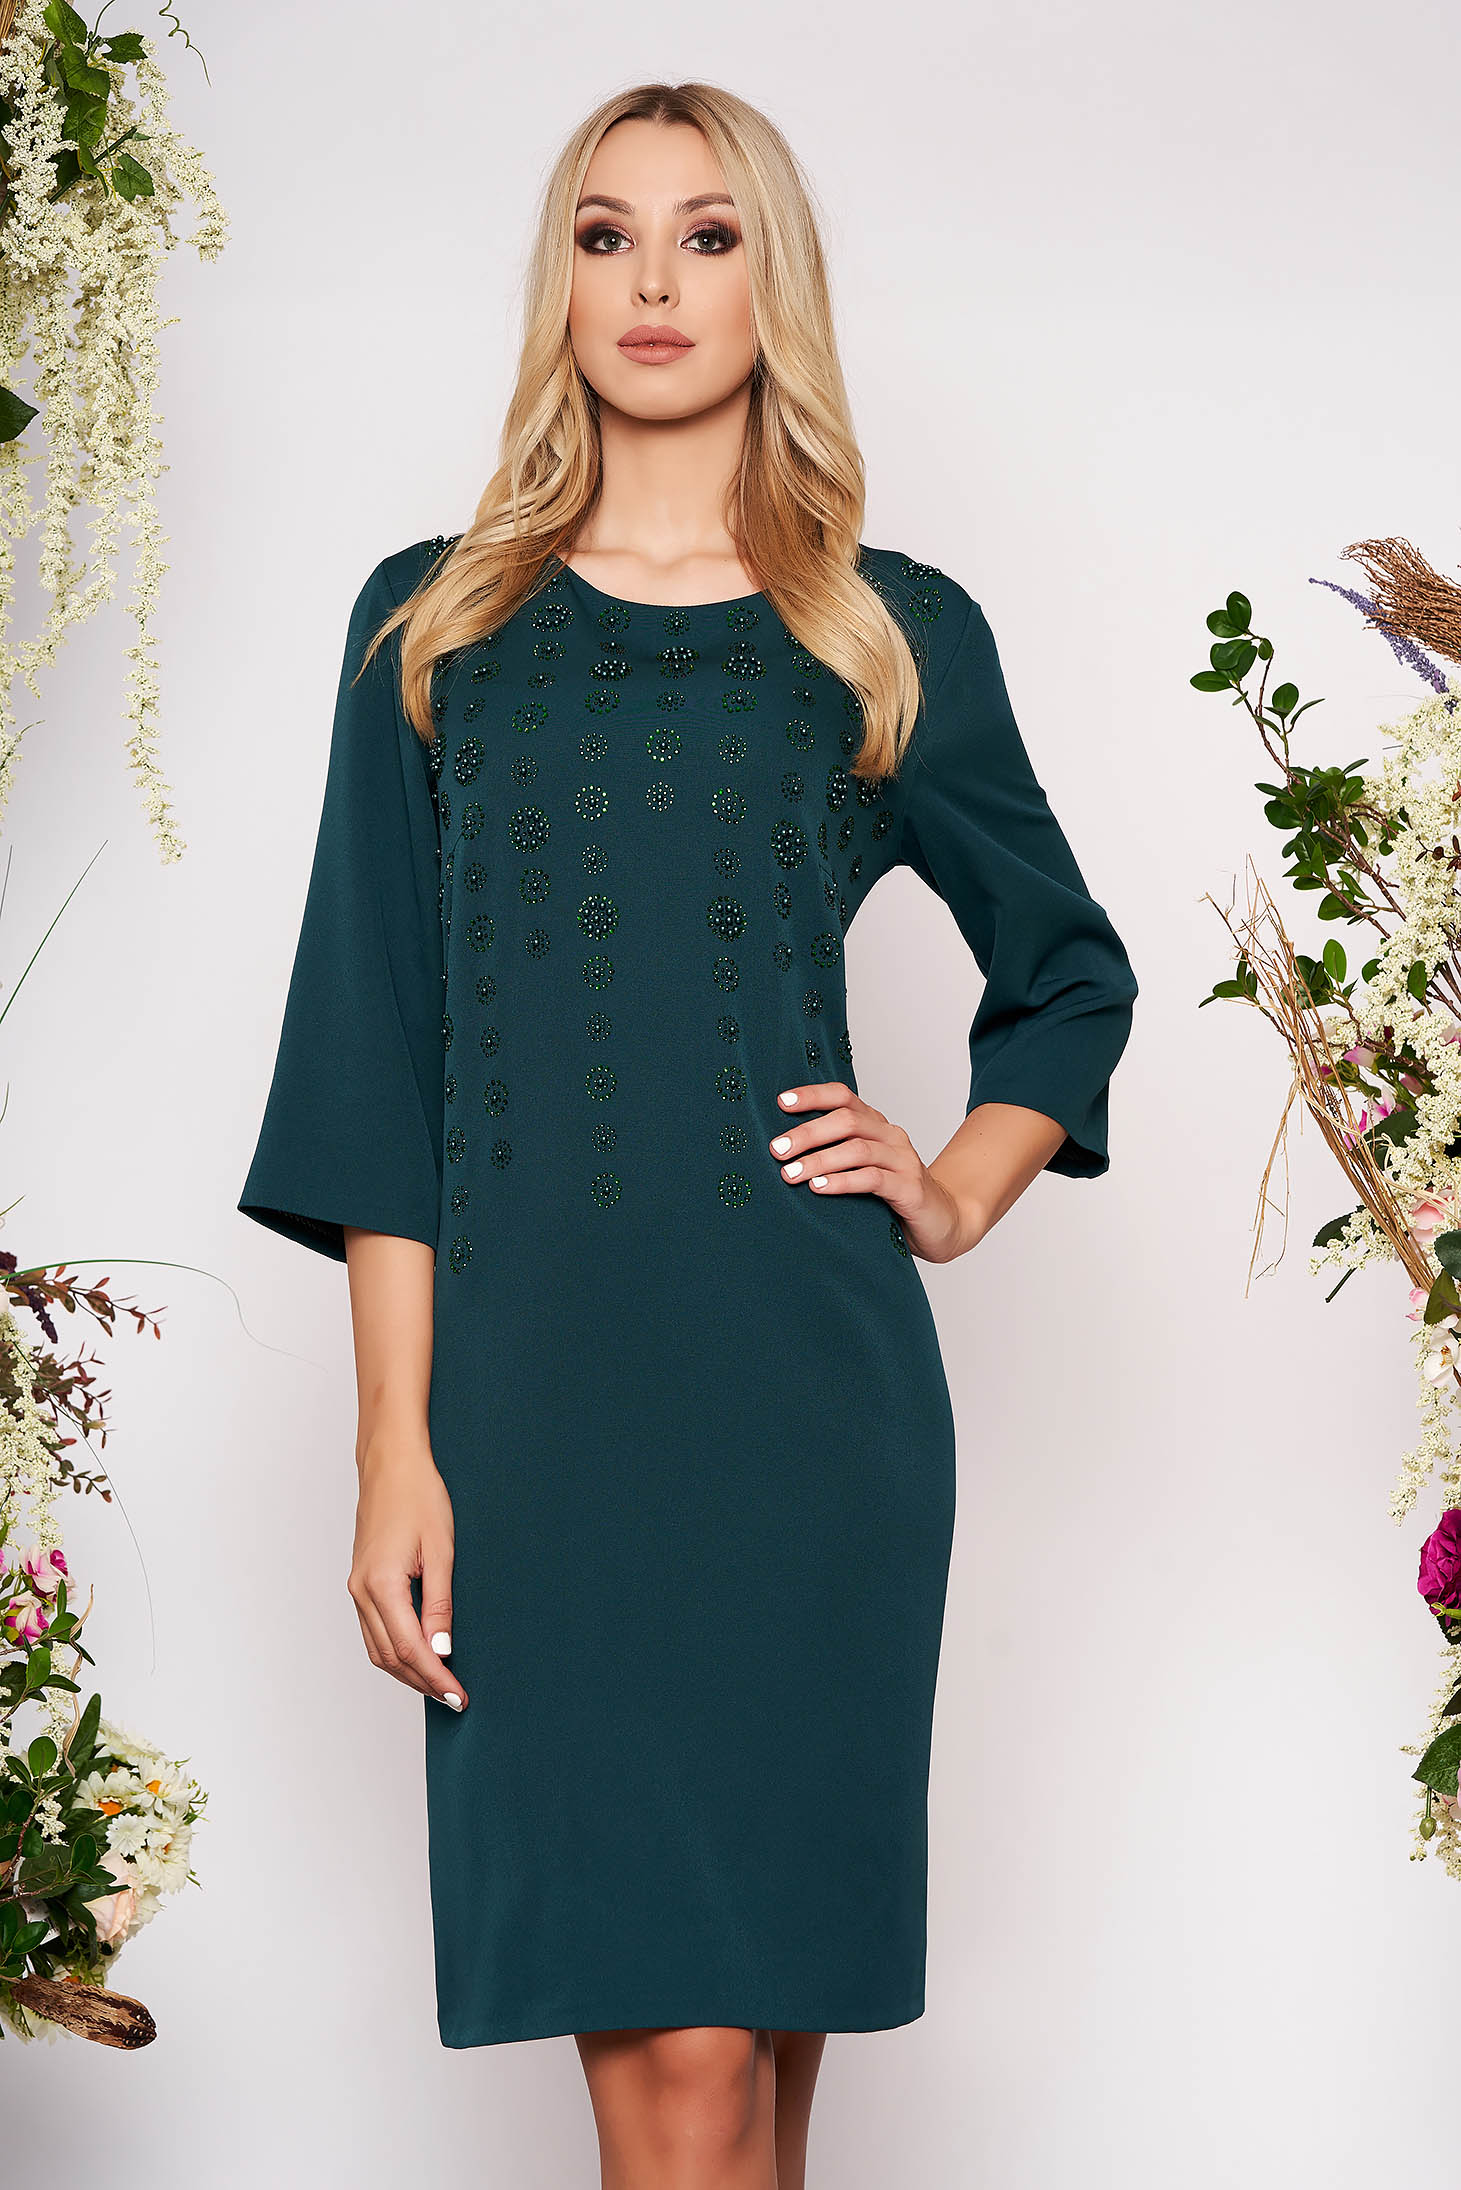 Rochie verde petrol eleganta midi cu un croi drept din stofa subtire cu maneci trei-sferturi cu aplicatii din margele si pietre strass